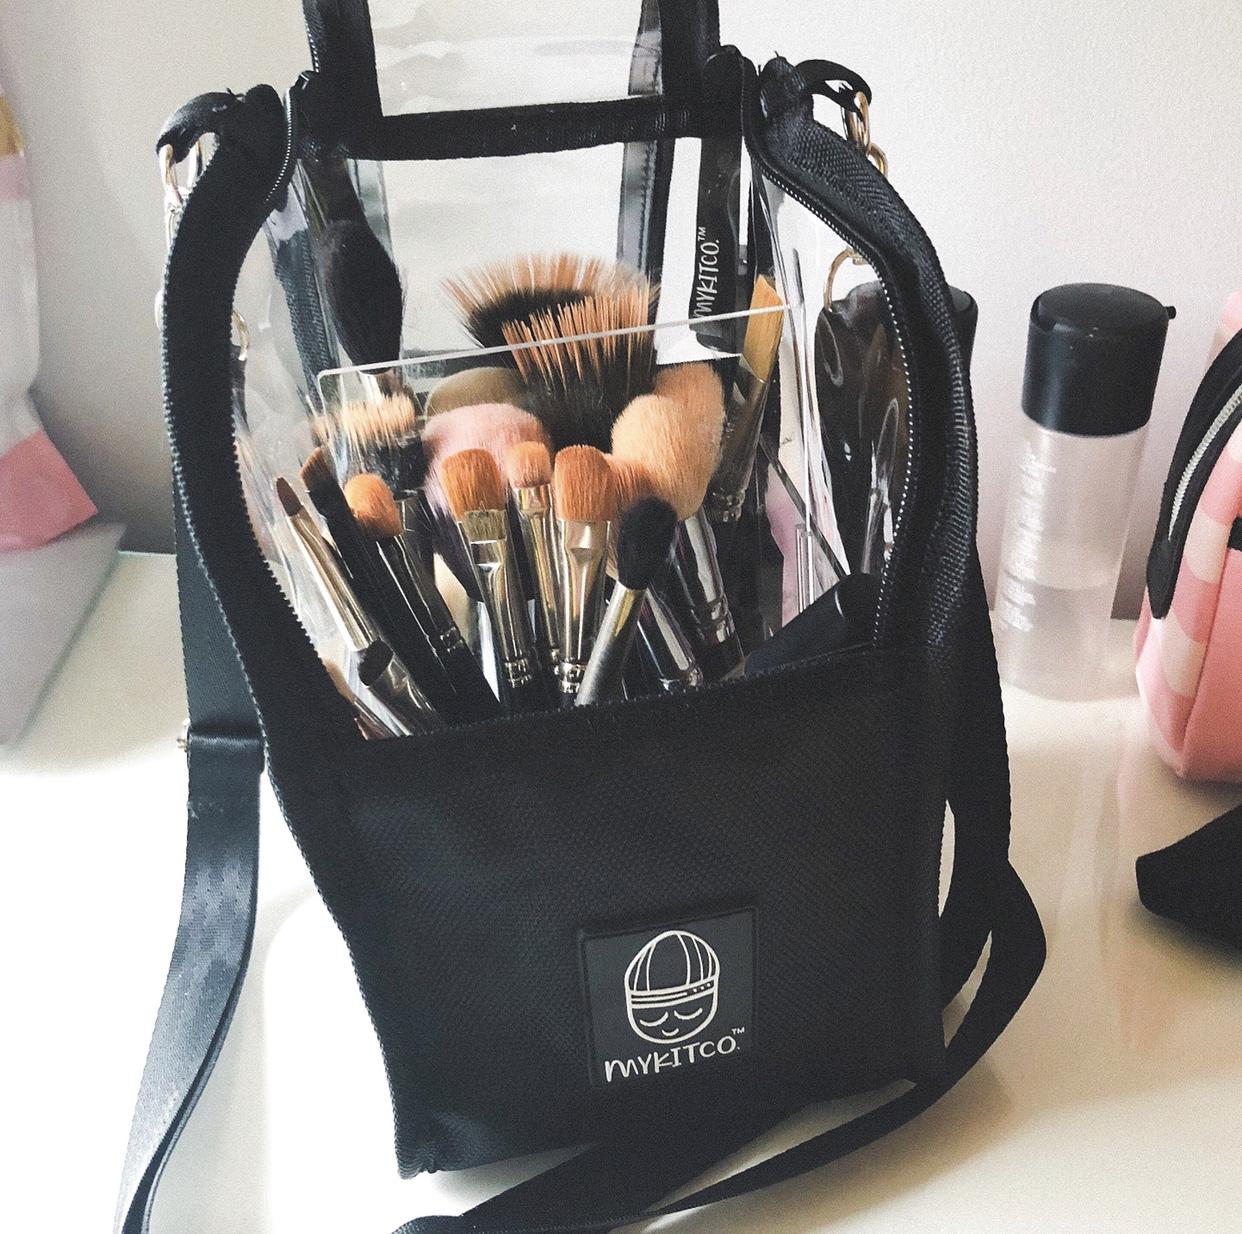 My Kit Co Makeup Brush Buddy